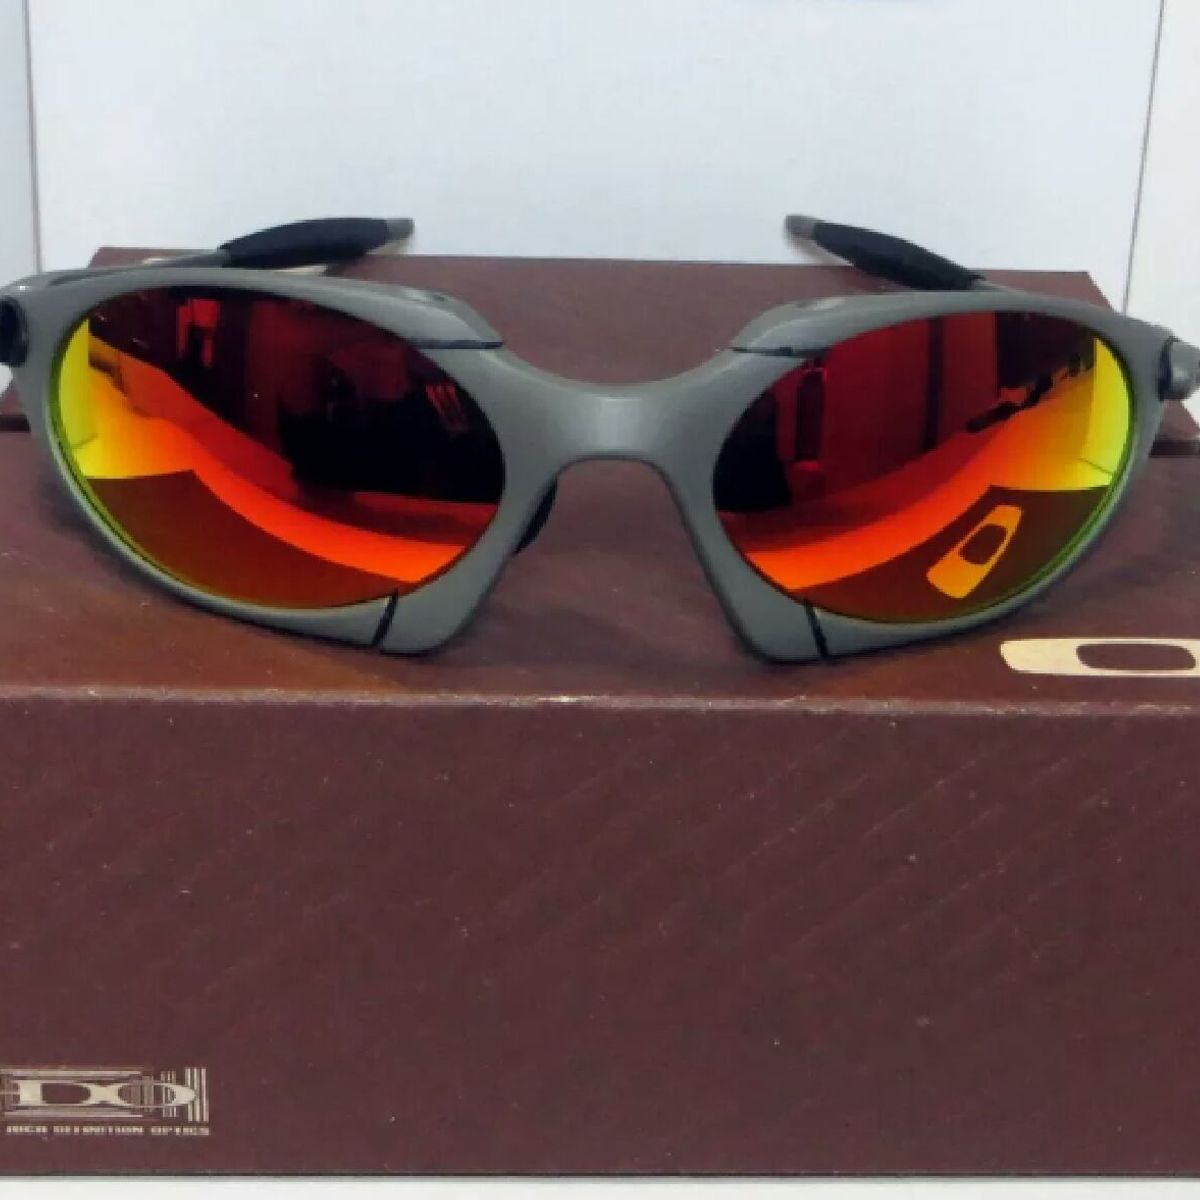 a063280d0 Óculos de Sol Oakley Romeo 1 Xmetal Novo Na Caixa | Óculos Masculino Oakley  Nunca Usado 33864768 | enjoei